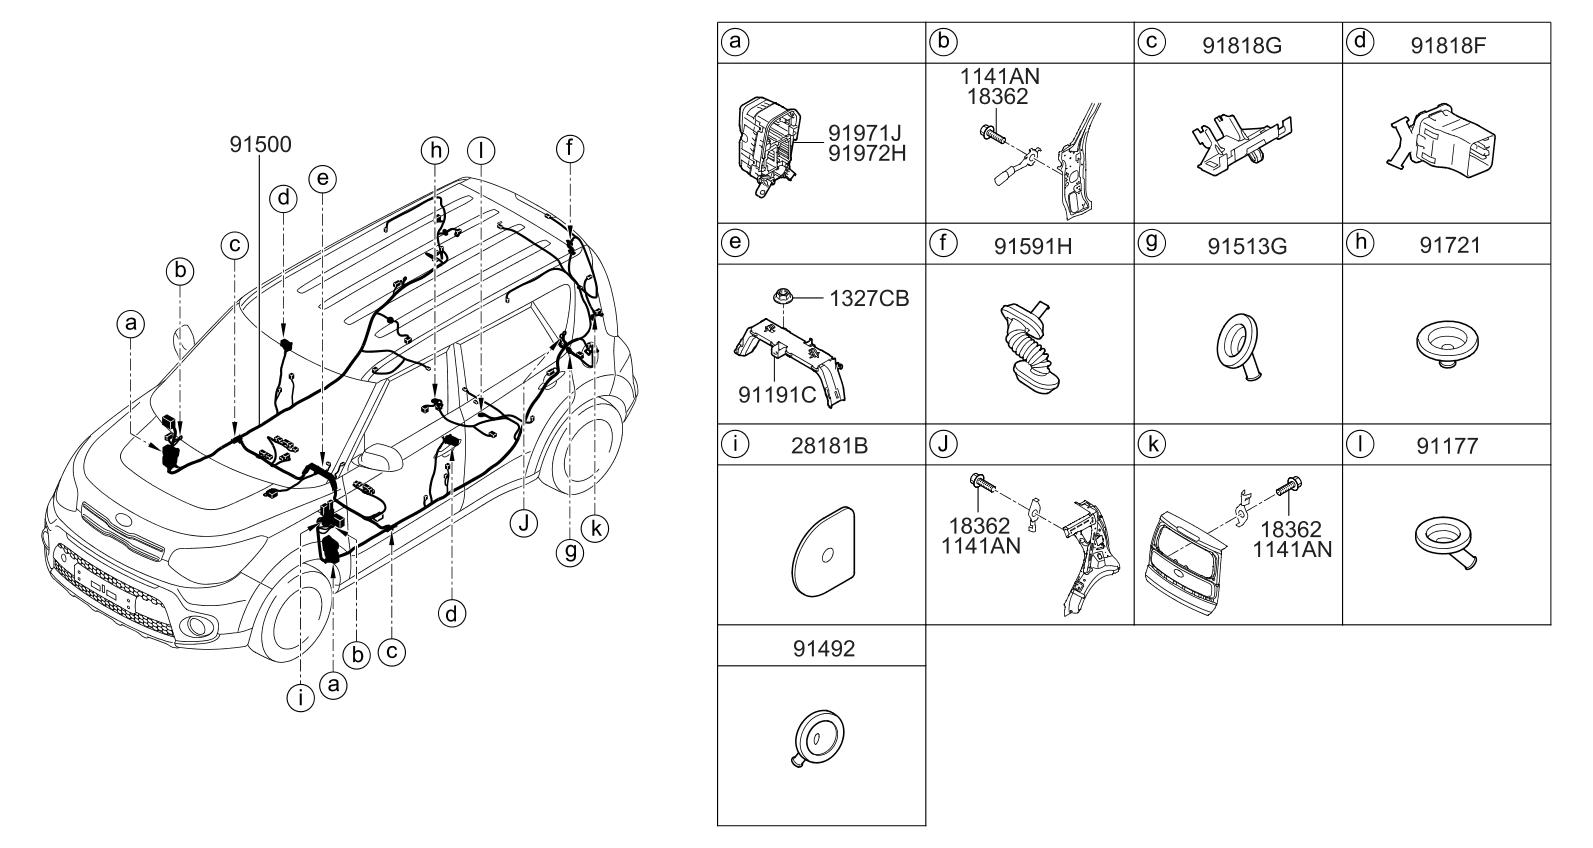 2017 kia soul wiring harness floor kia parts now rh kiapartsnow com kia soul radio wiring harness